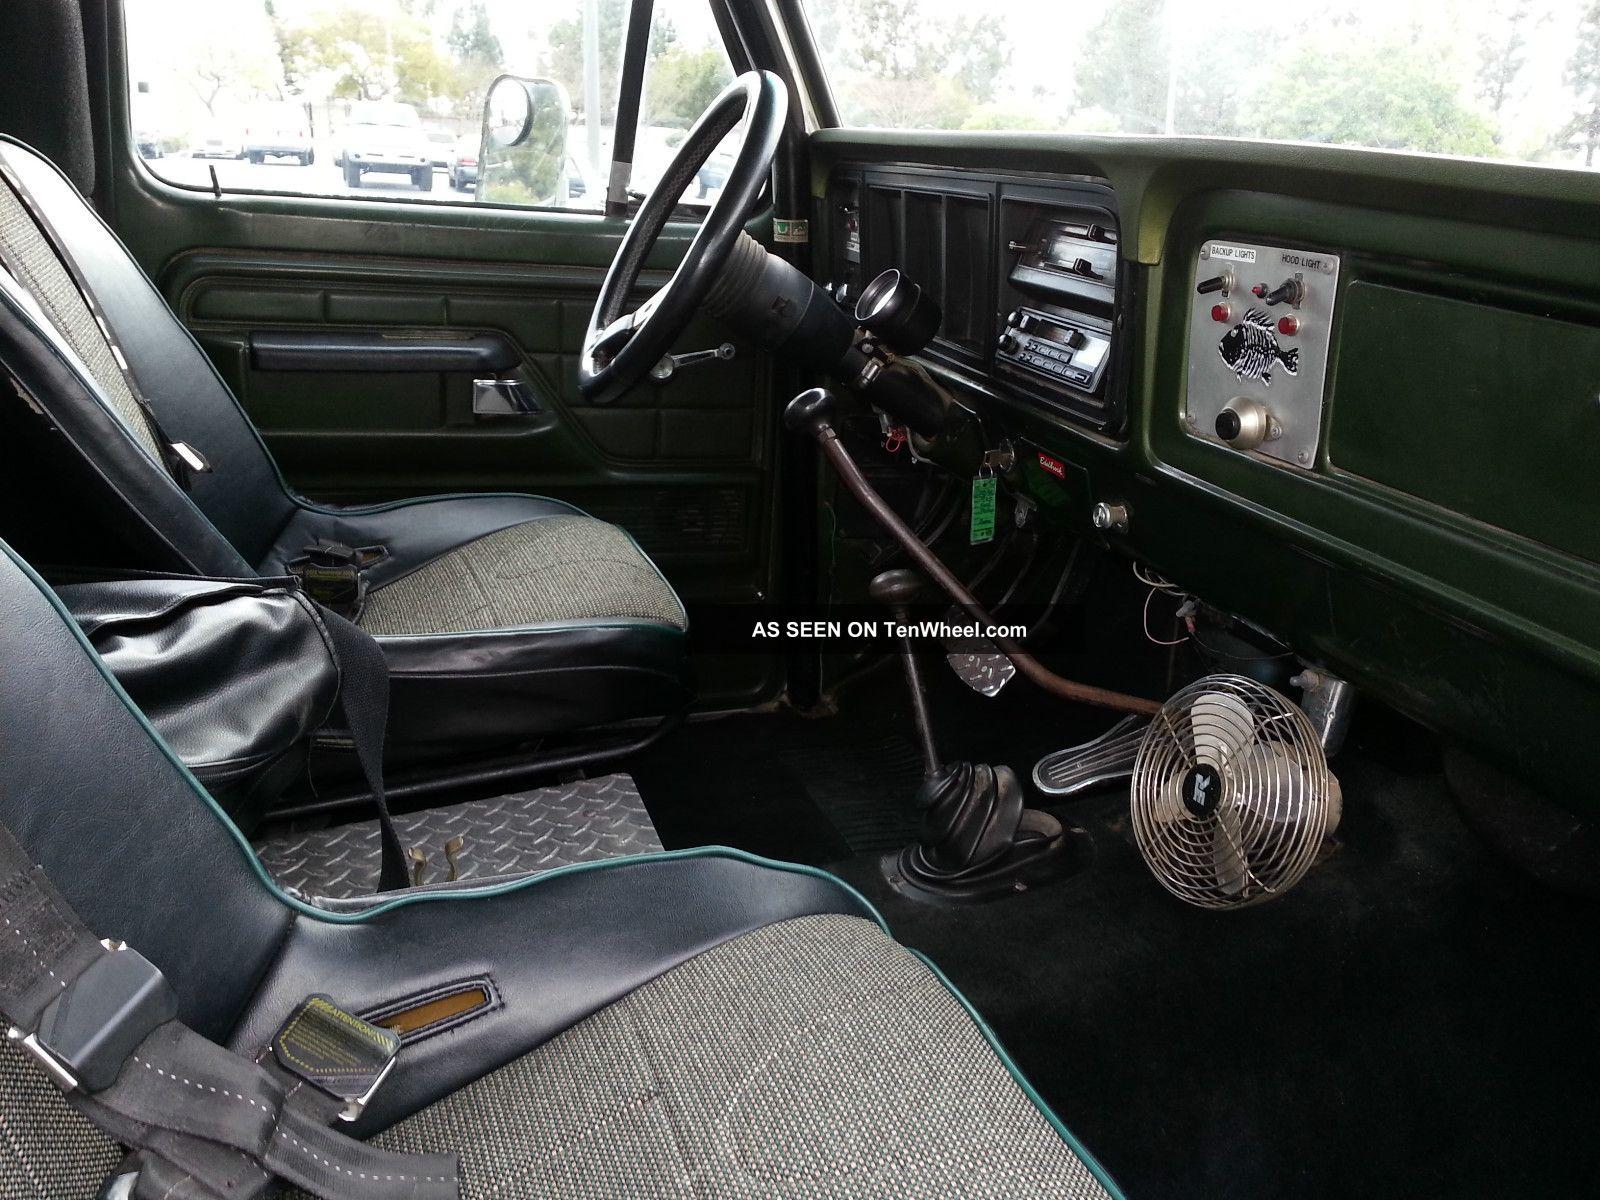 1975 Ford Highboy Interior Design 3d 1970 4x4 F100 Off Road Rust California Truck Rh Tenwheel Com